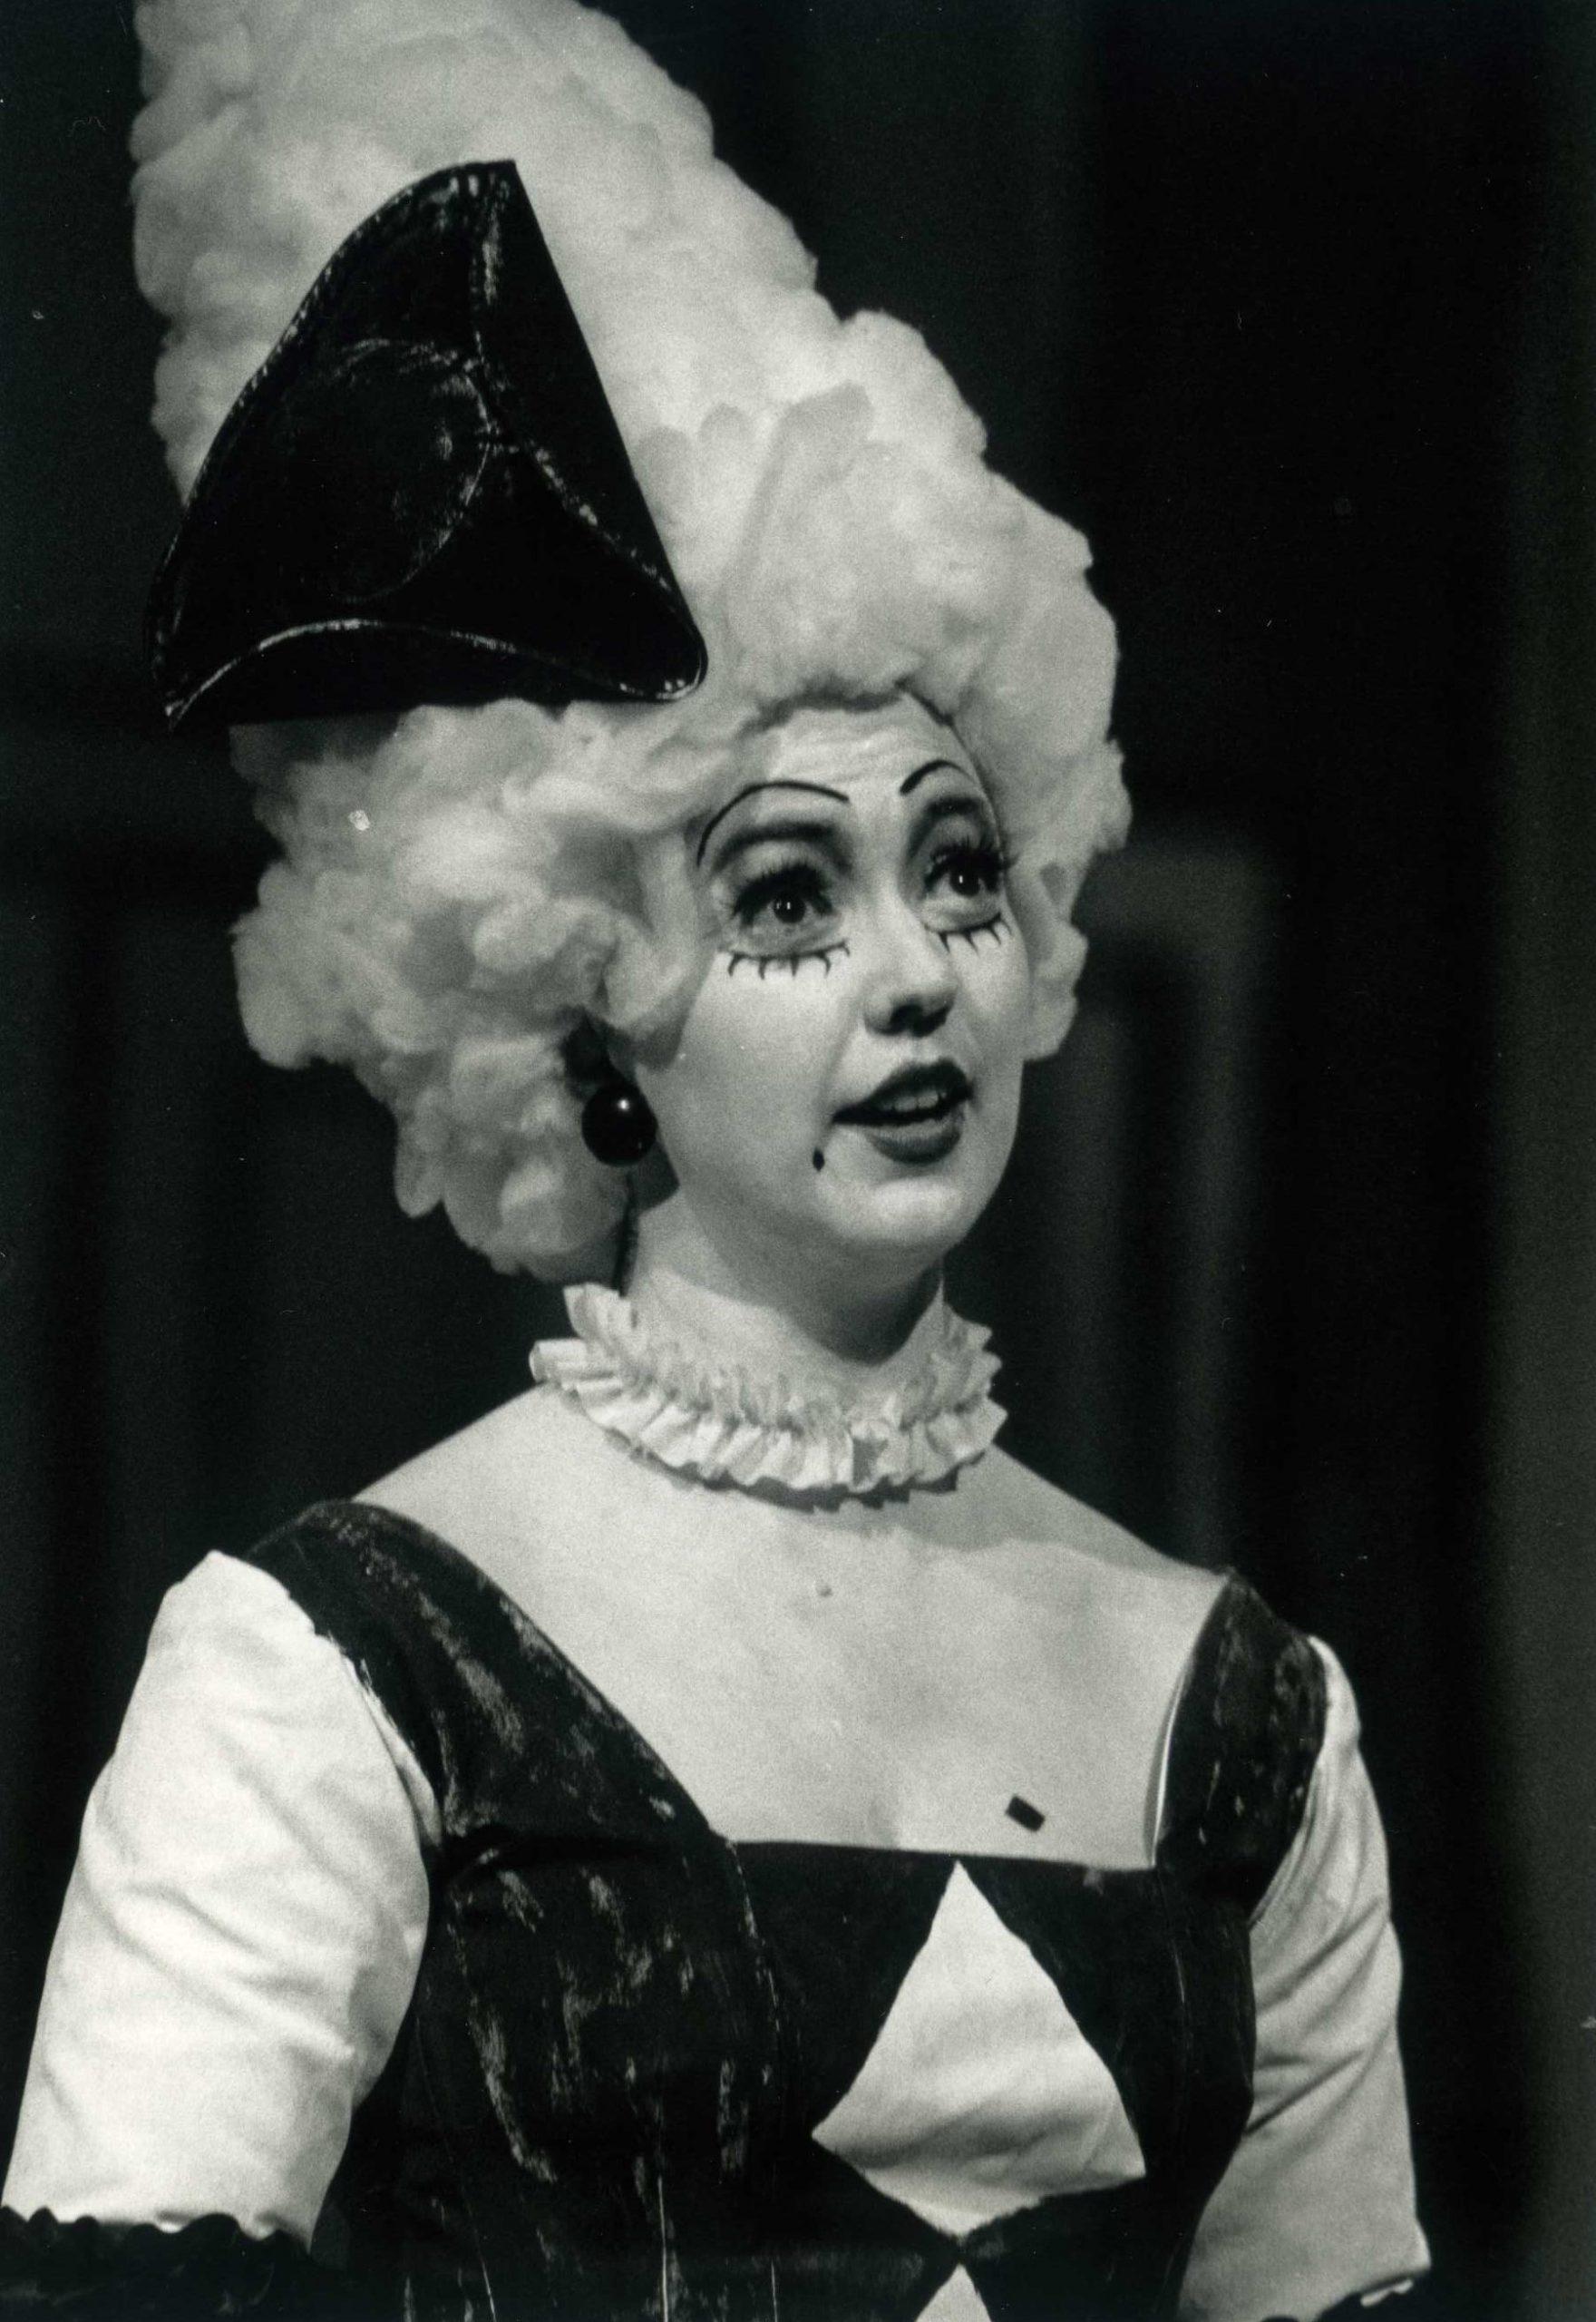 La Finta semplice à l'Opéra de Nice en 1991